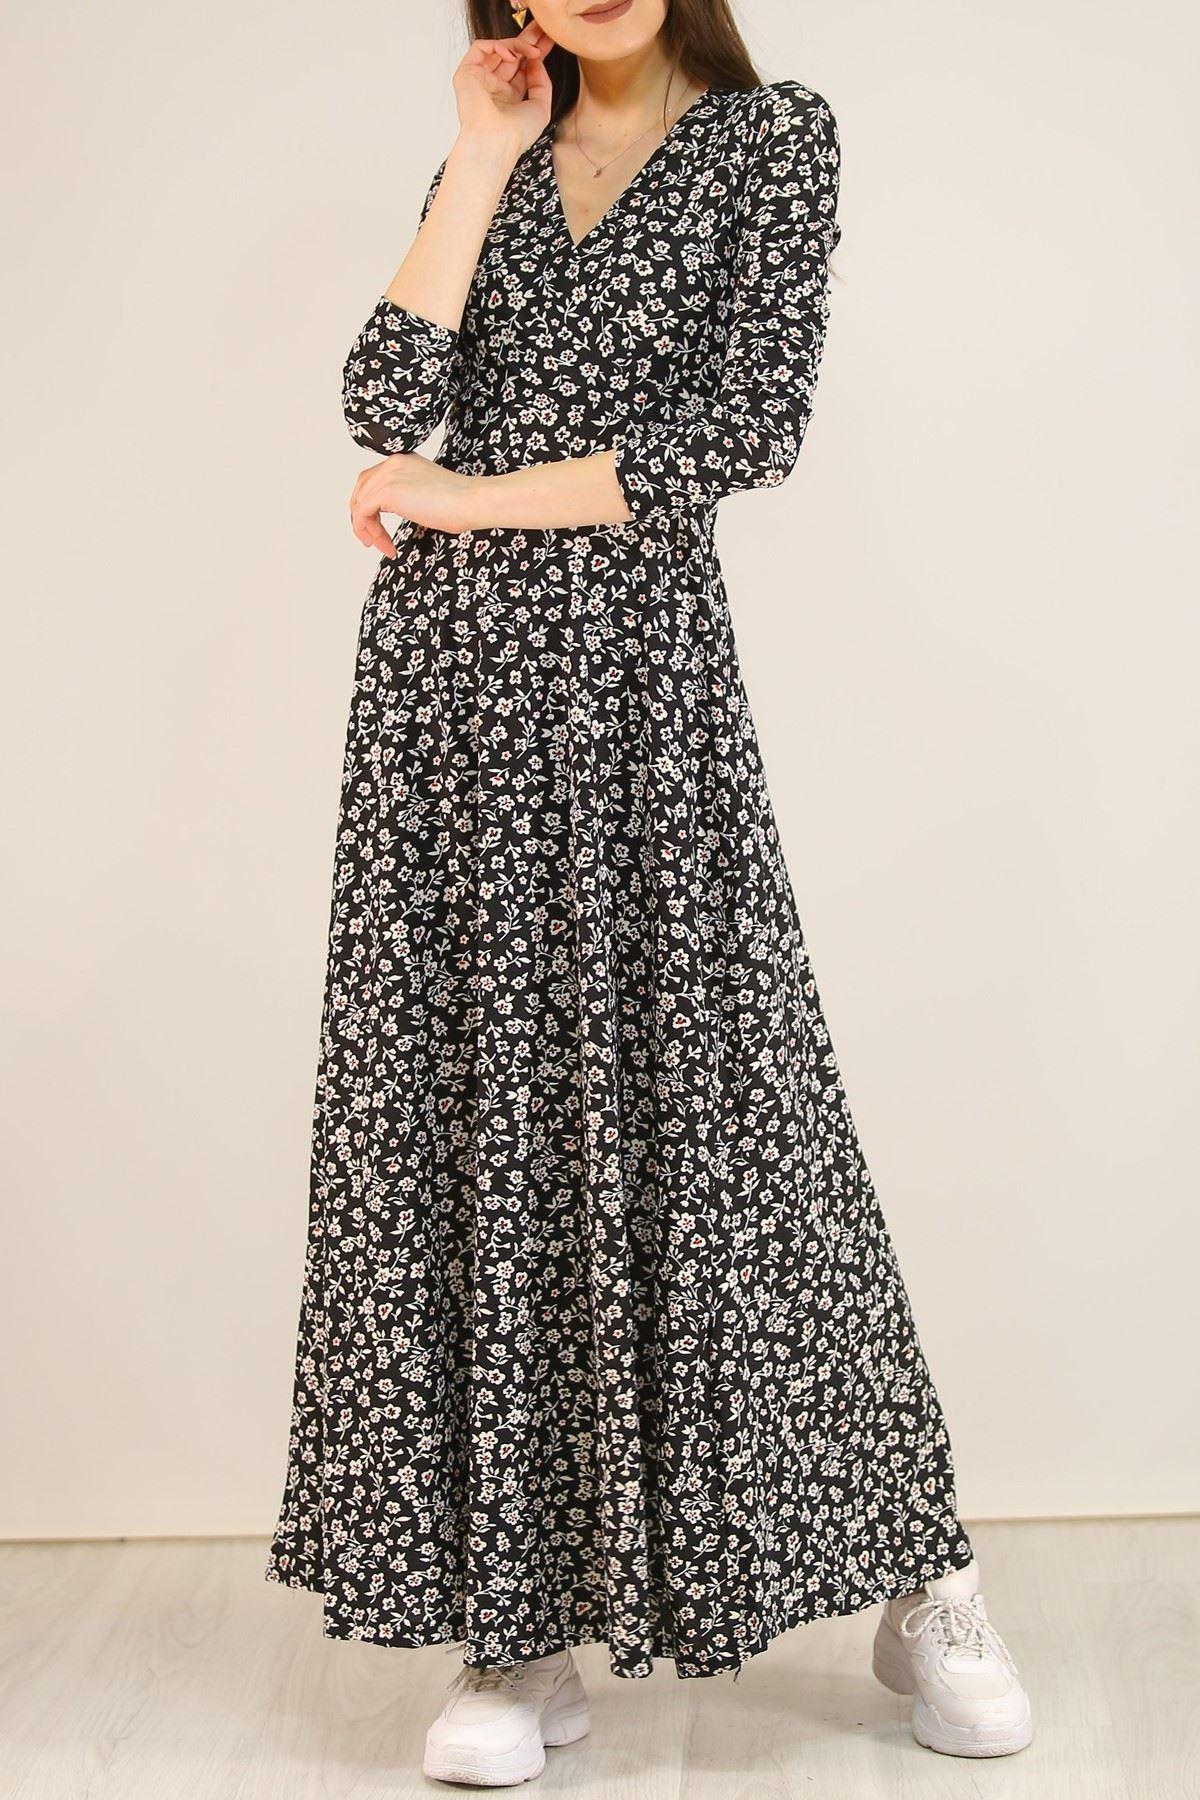 Çiçekli Elbise Siyah - 5070.716.